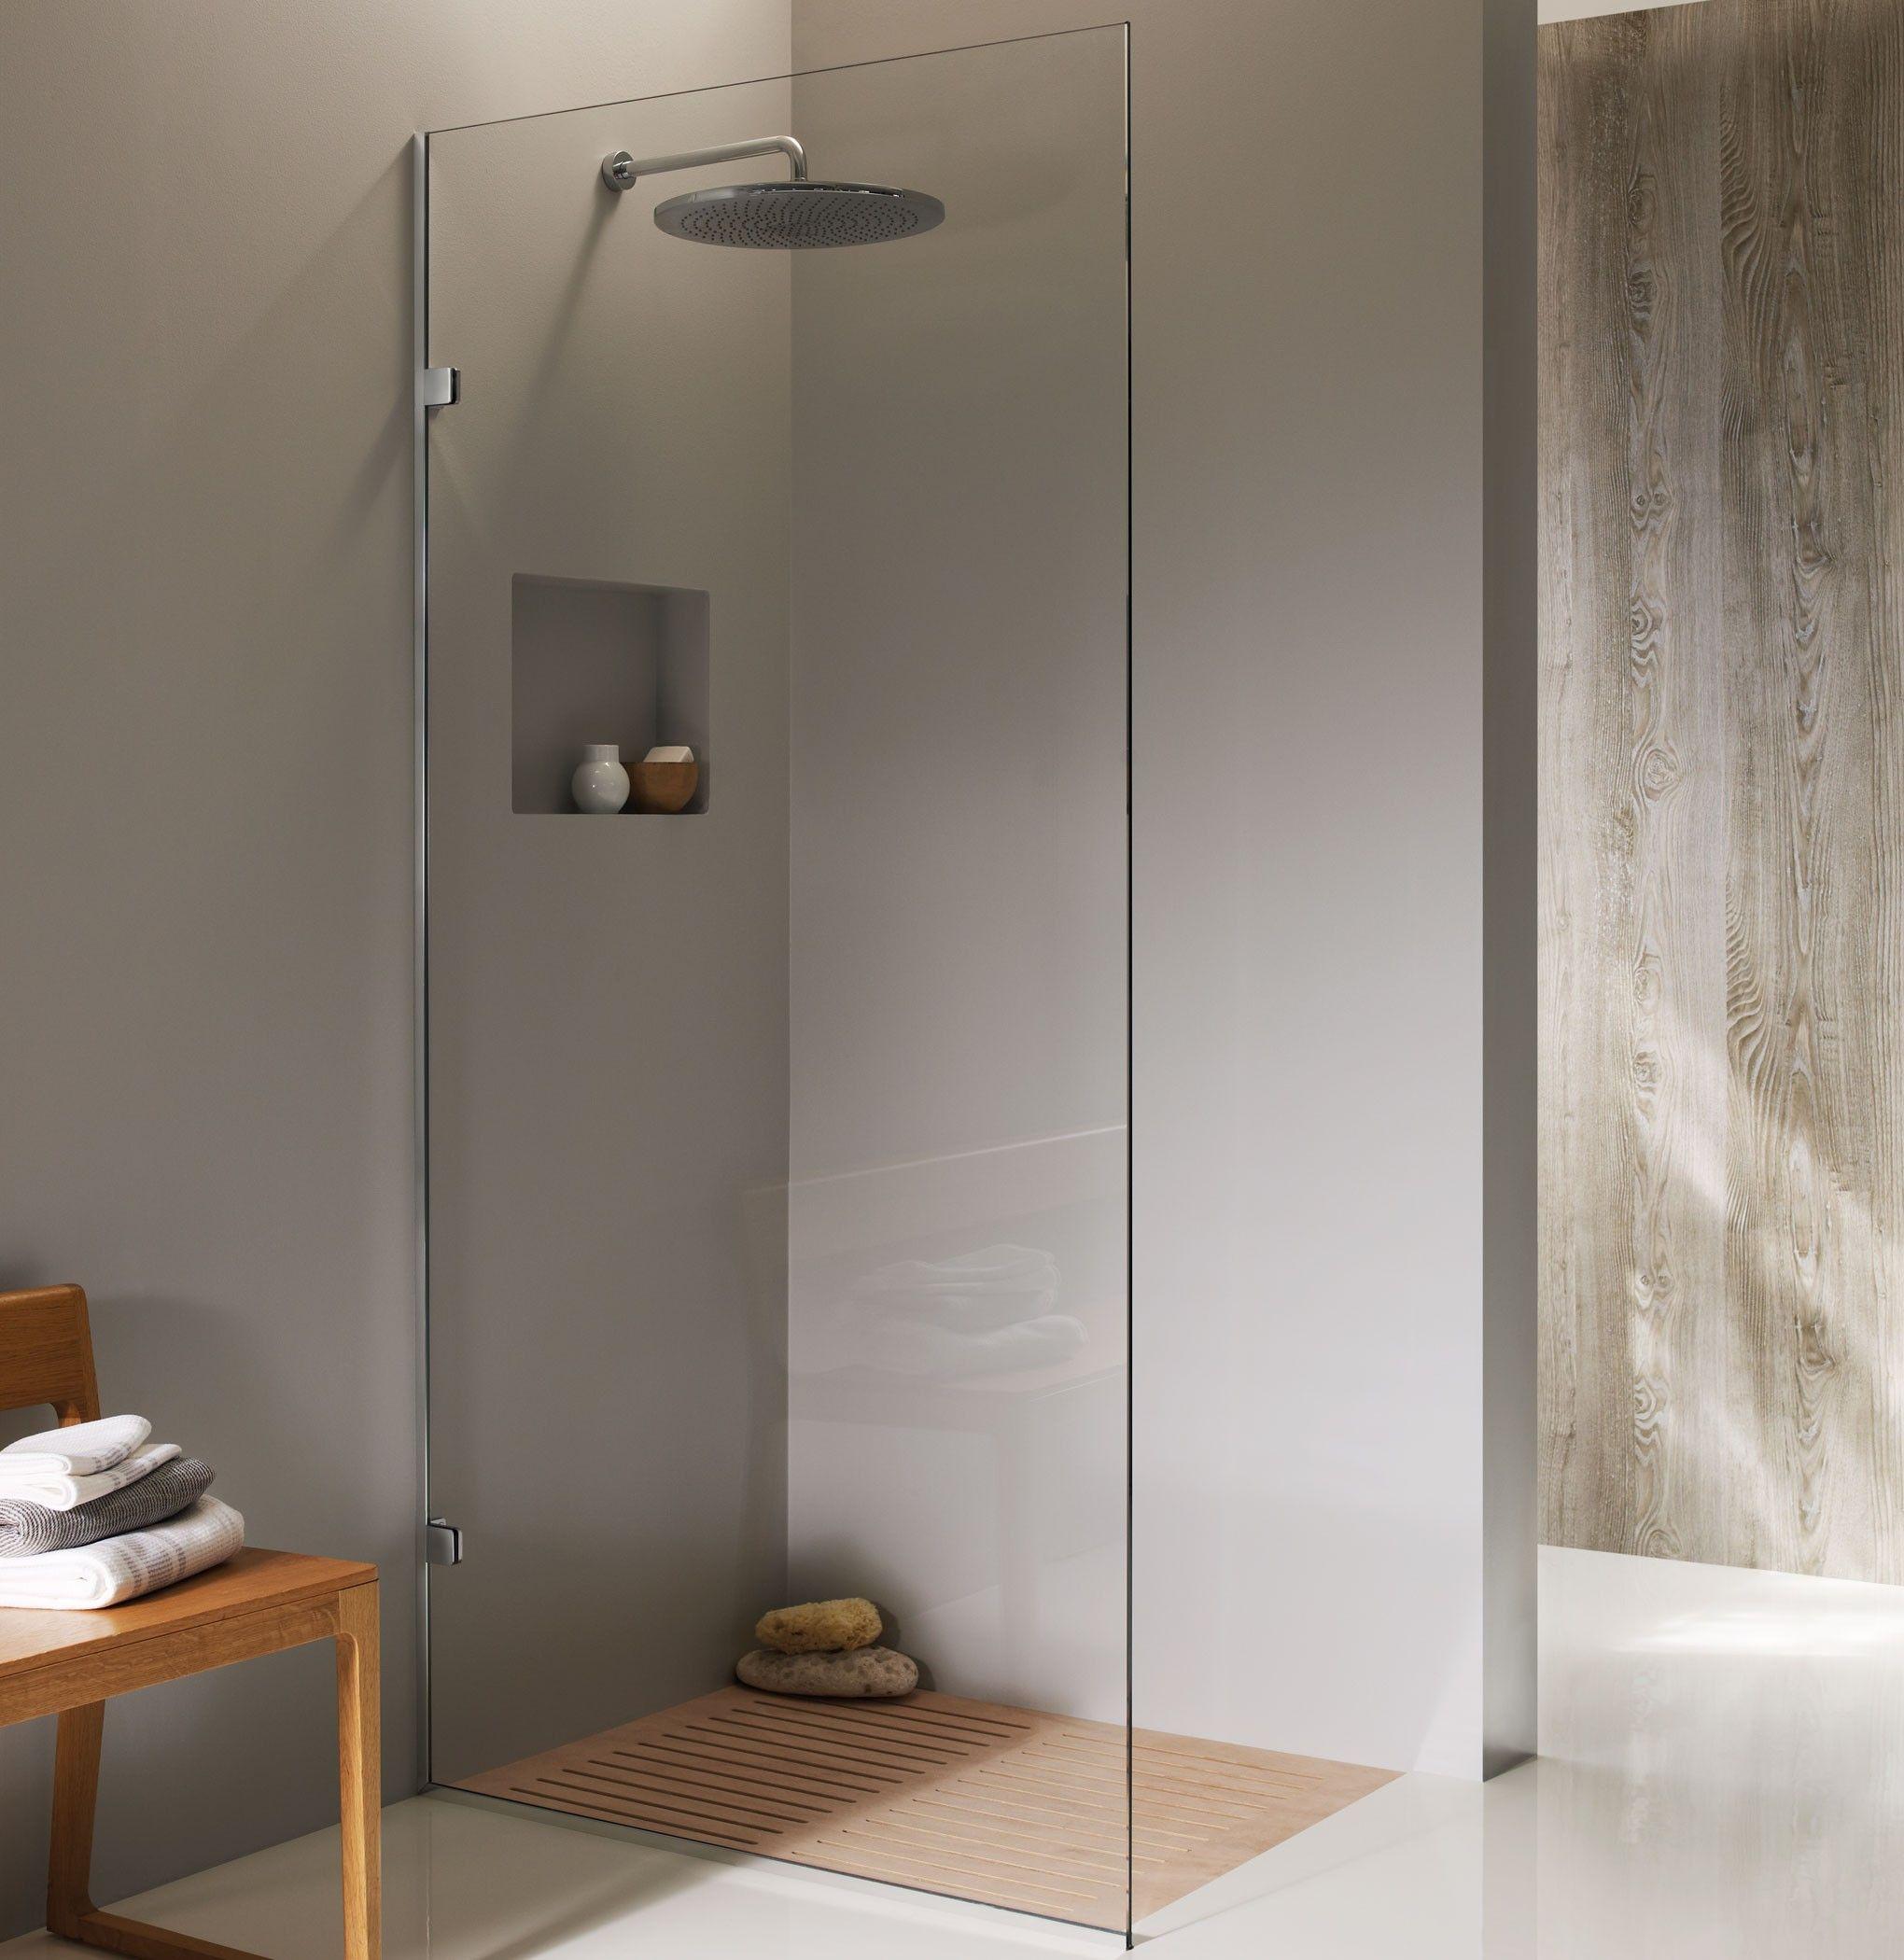 Majestic Monaco Shower Screen | Shower Doors & Cubicles | Pinterest ...